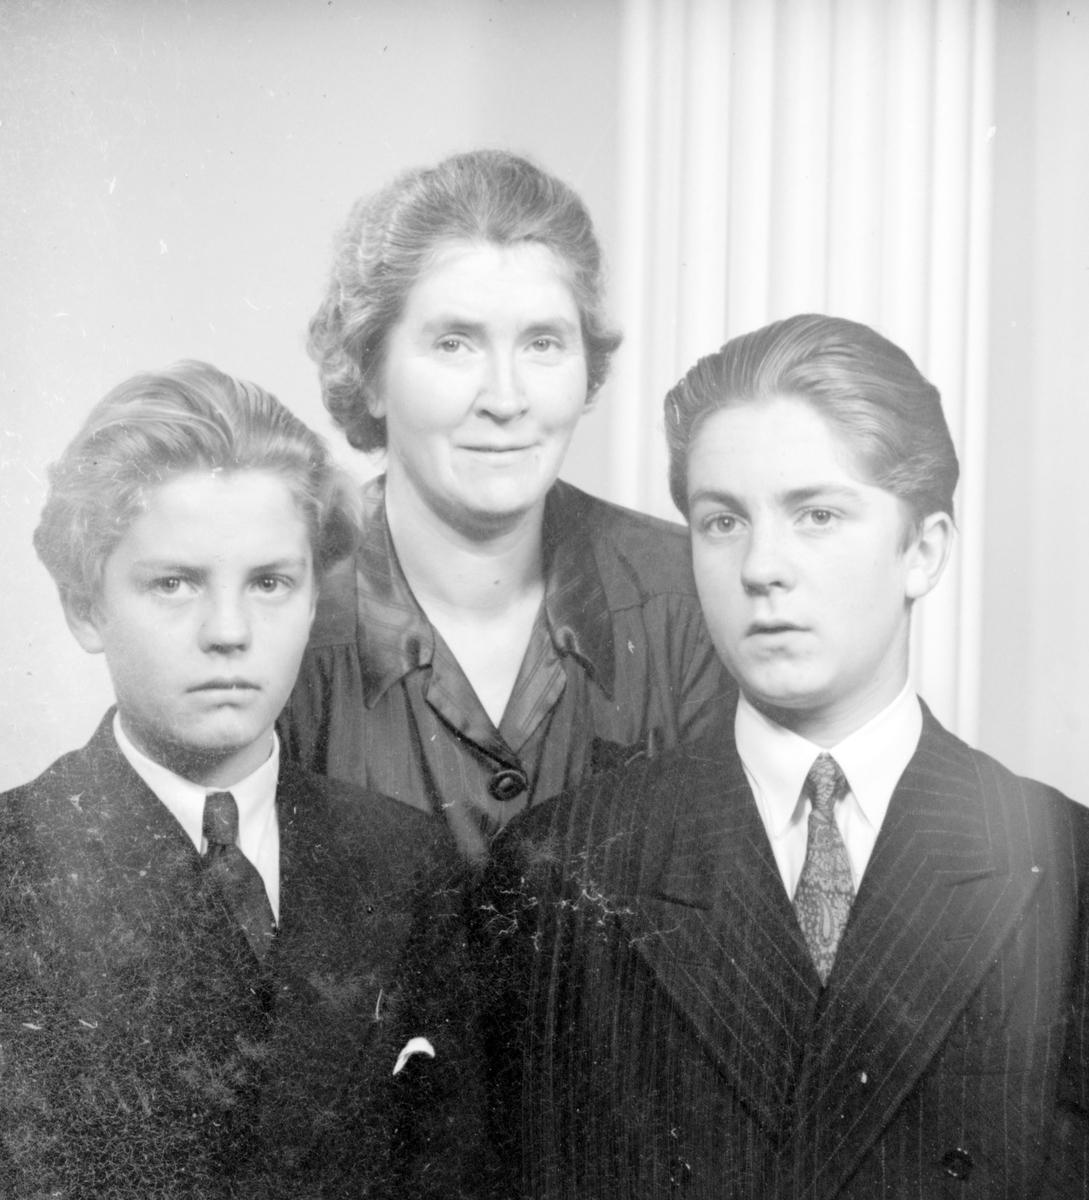 Familjen Hillborg, oktober 1944.